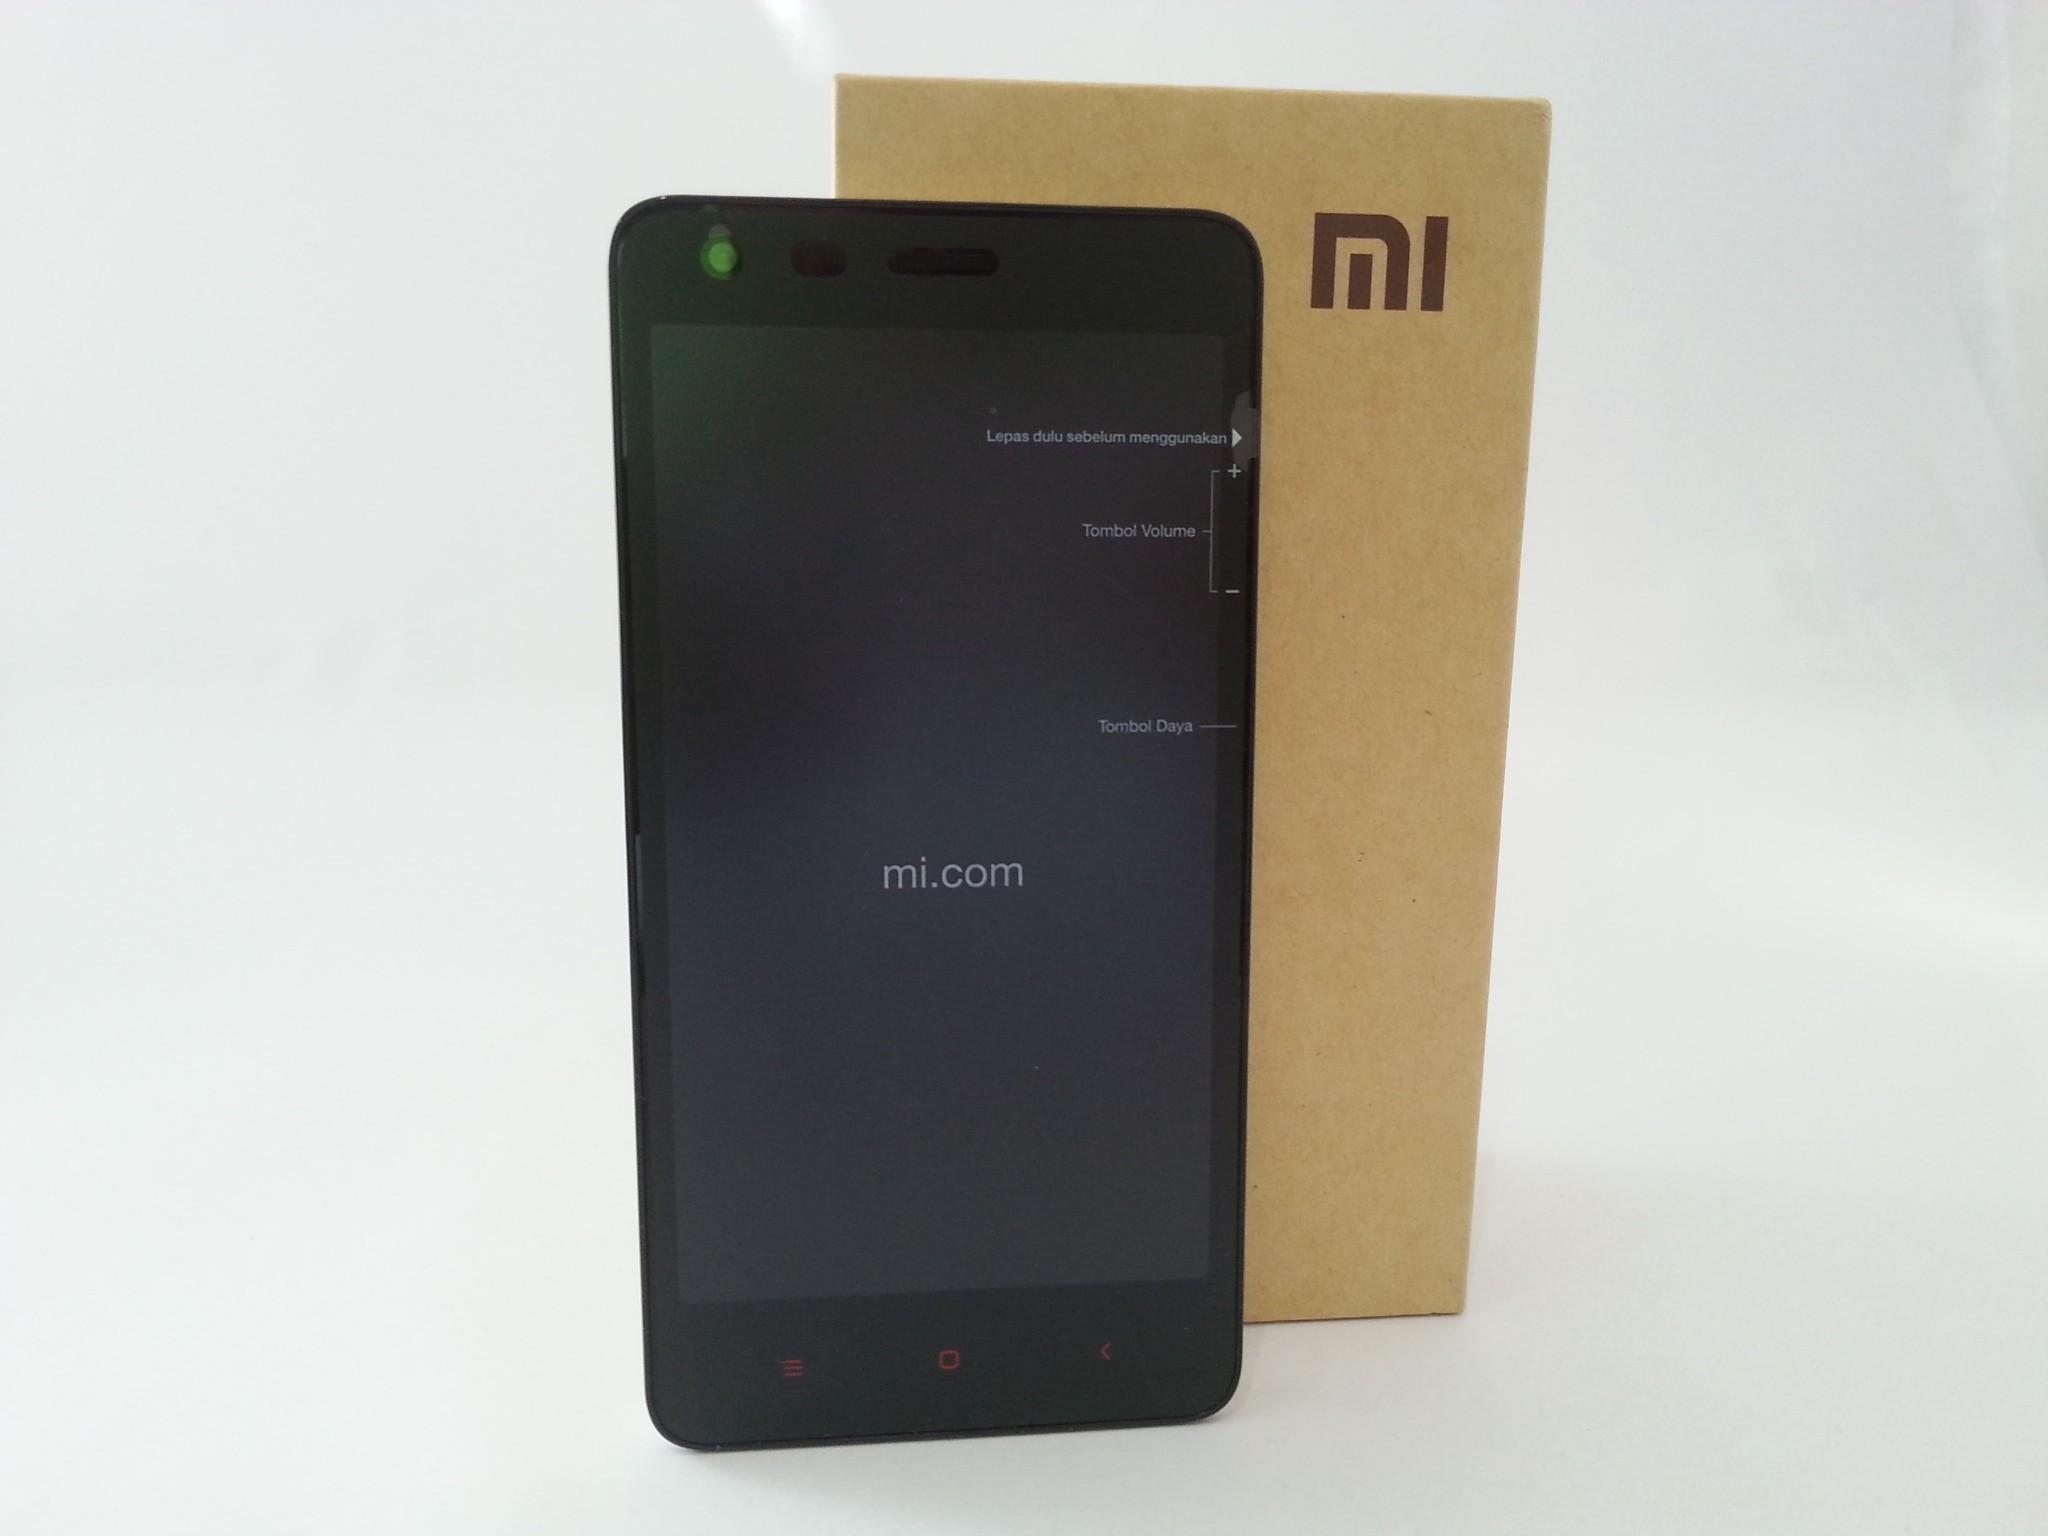 Jual Xiaomi Redmi 2 Prime 4G LTE Black White Garansi